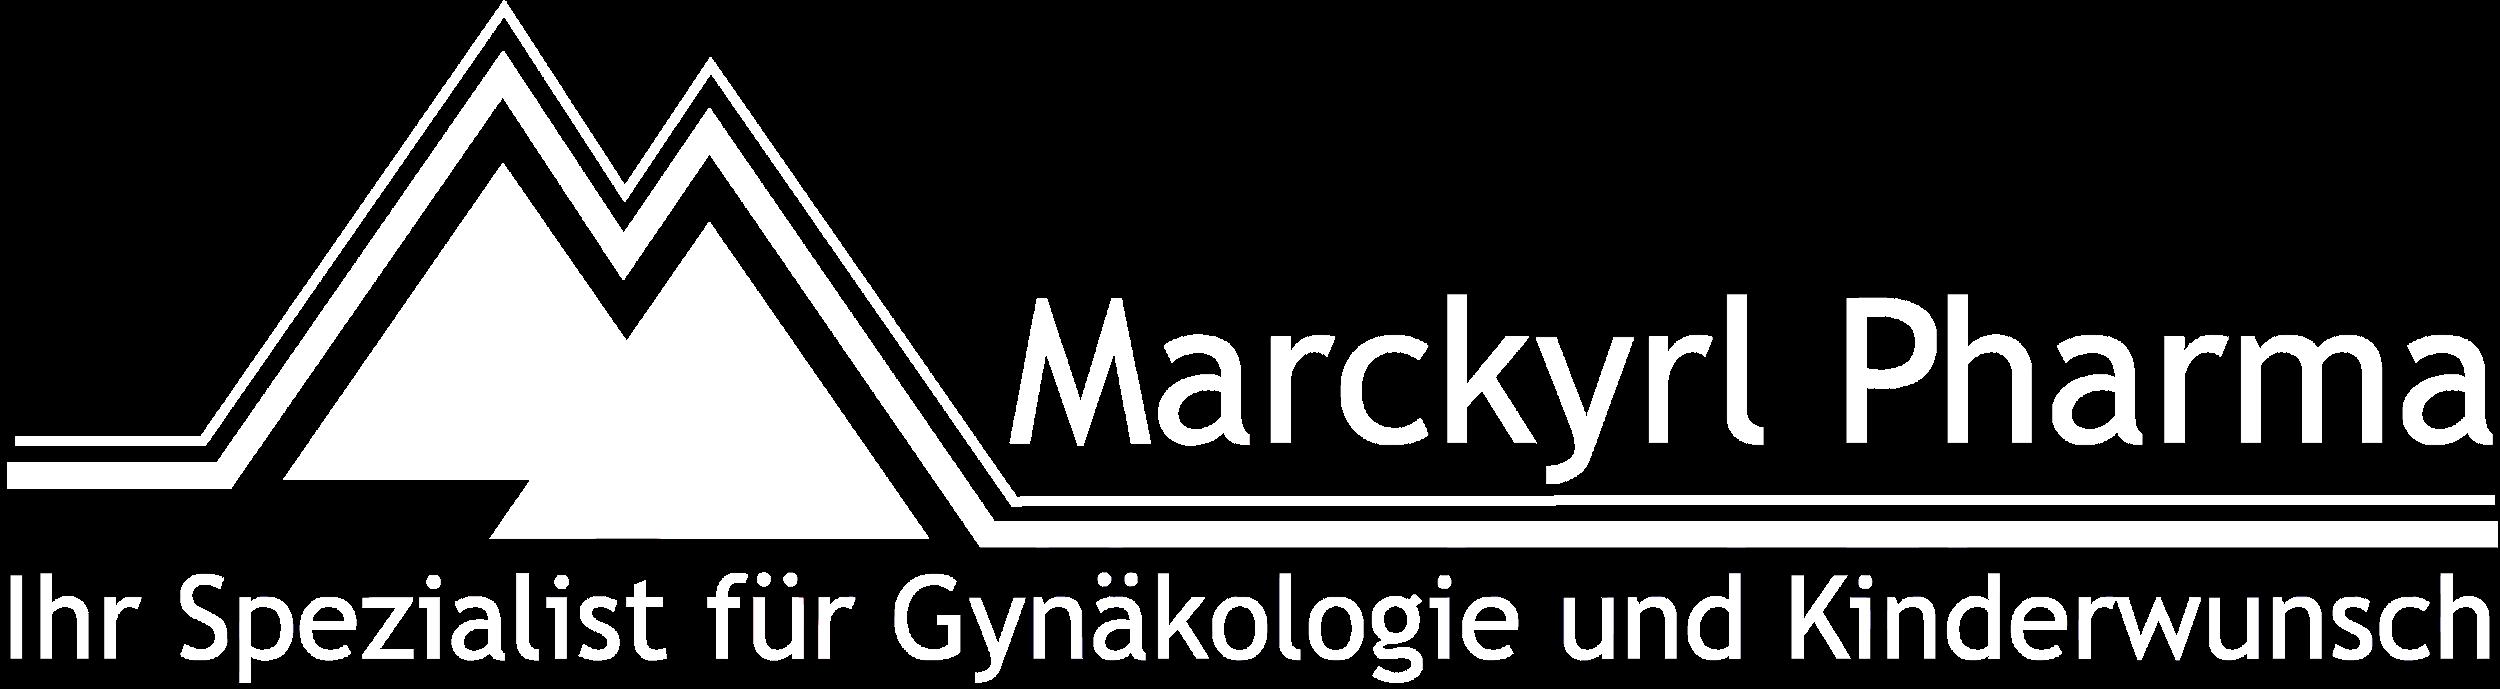 Logo Marckyrl Pharma